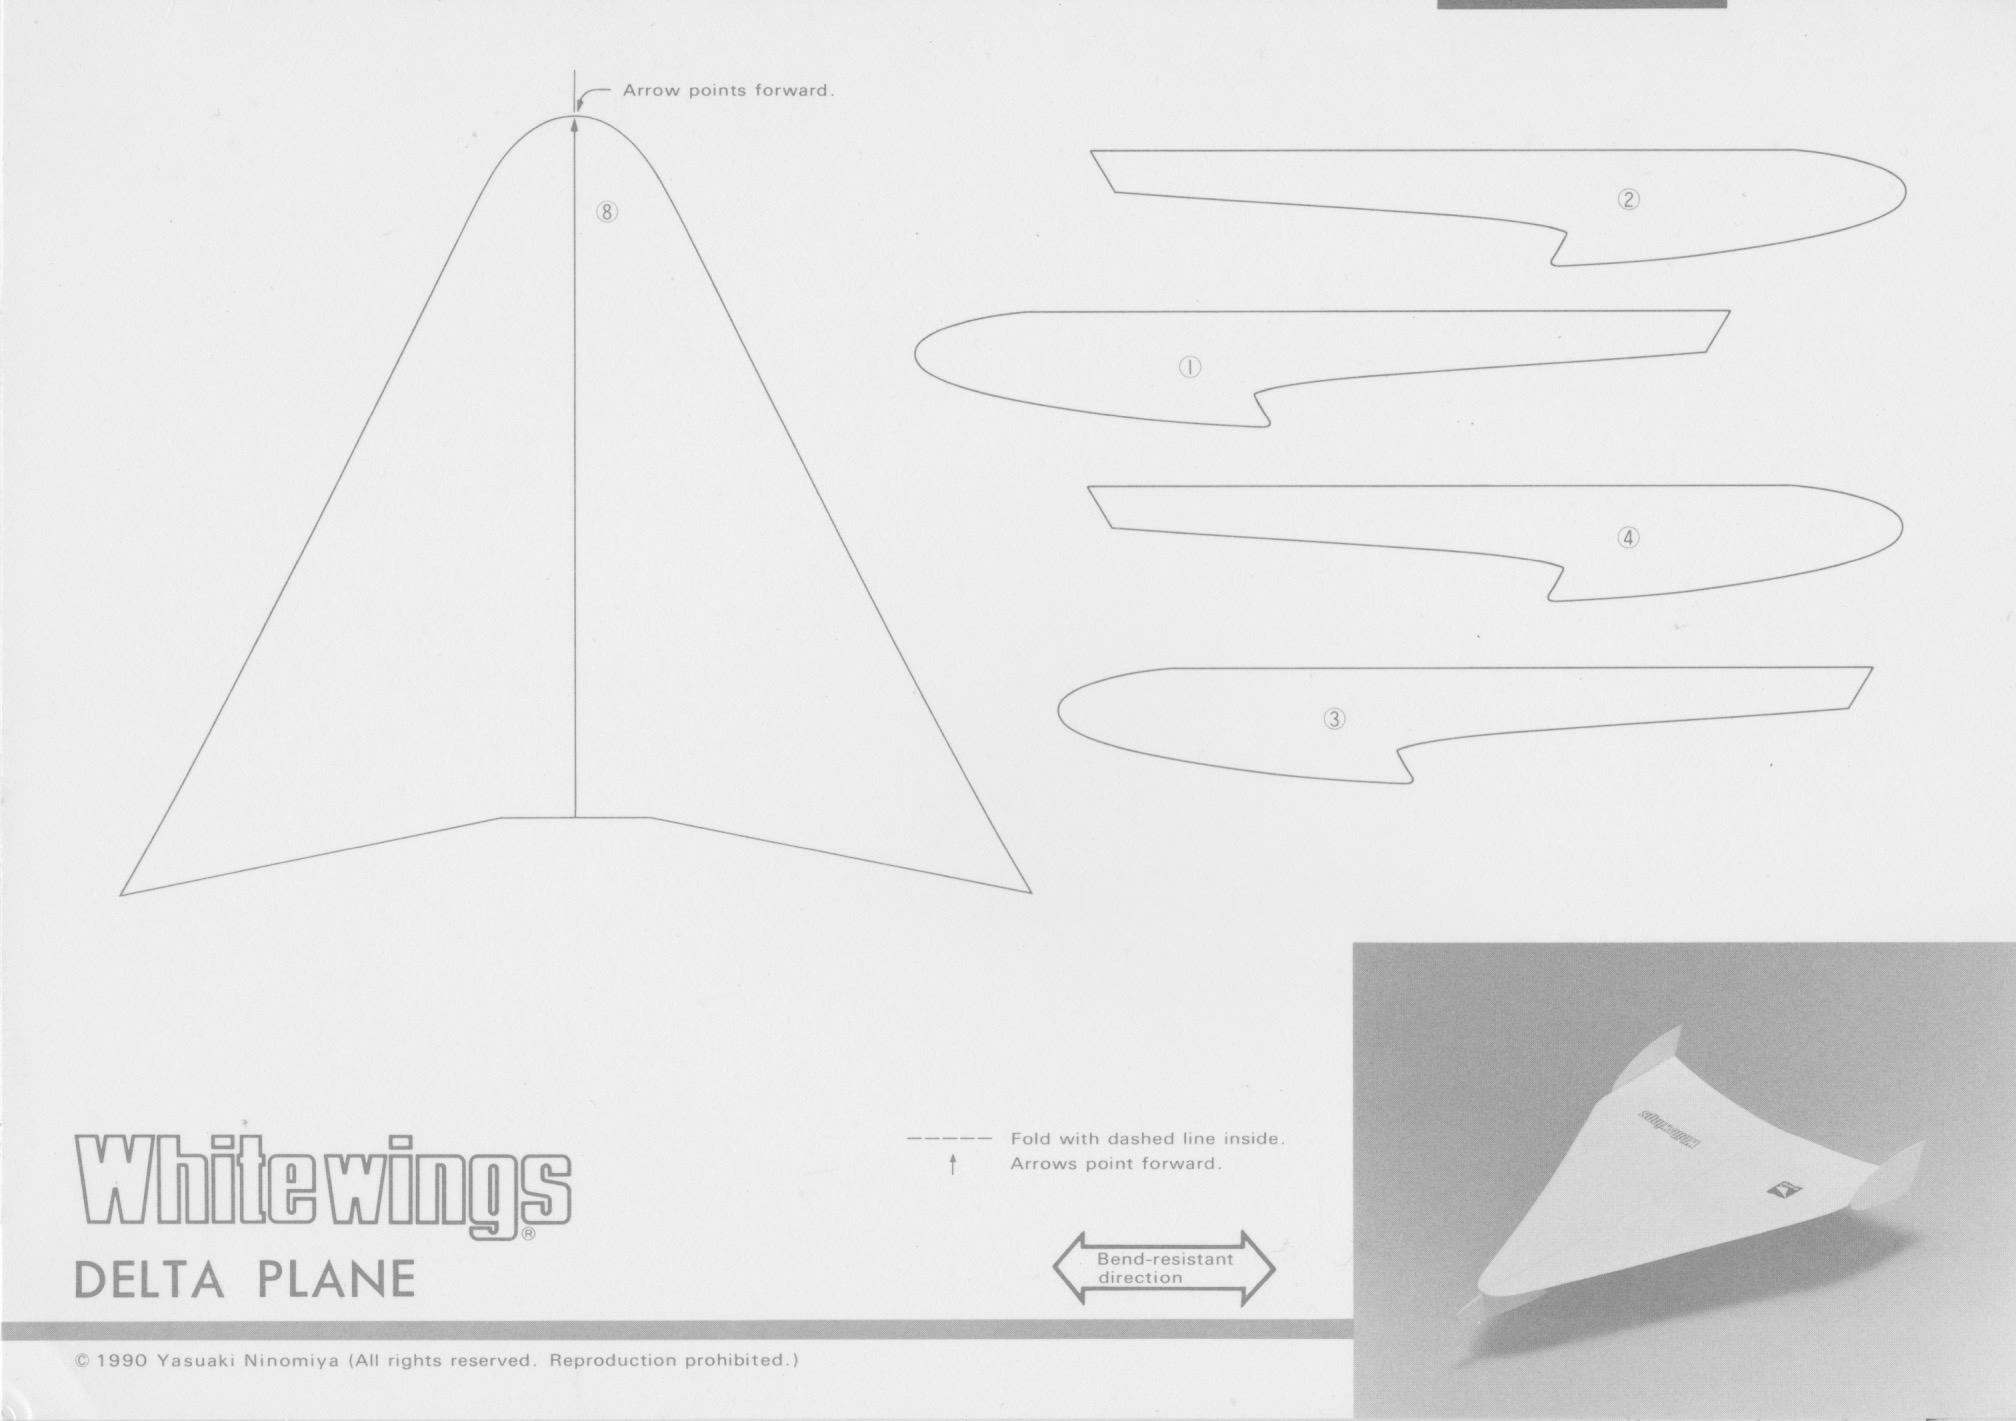 Delta_Plane_1.jpg